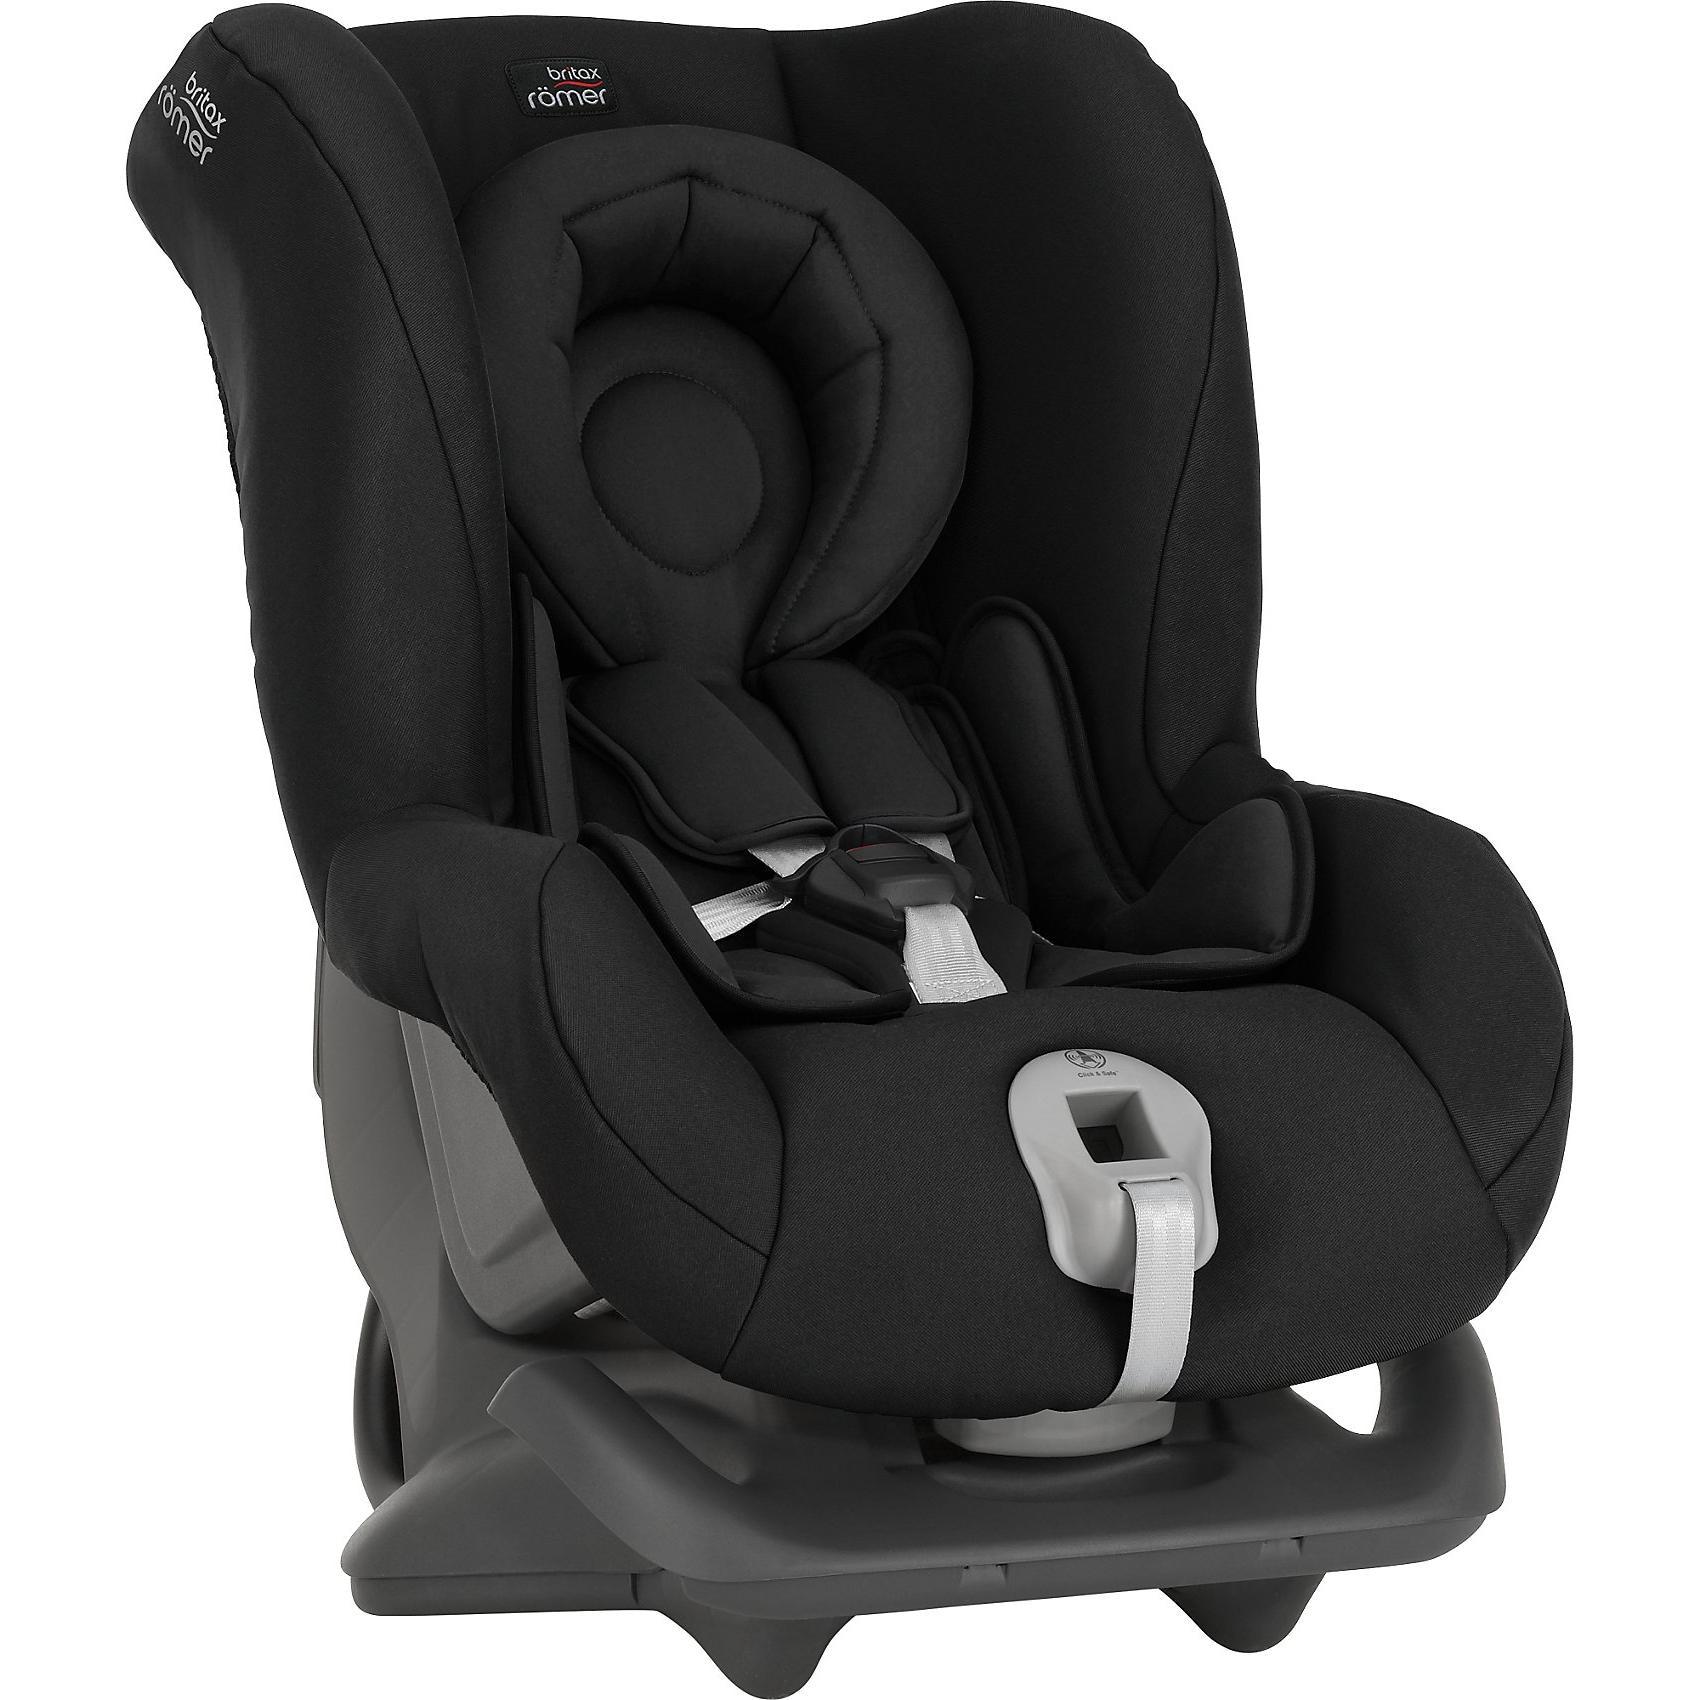 Britax Römer Auto-Kindersitz First Class Plus Cosmos Black 2018